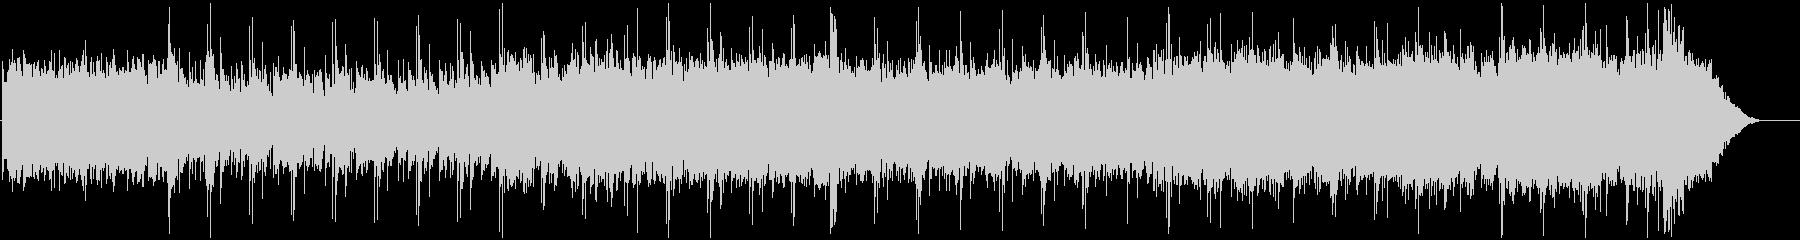 Fantastic music box's unreproduced waveform